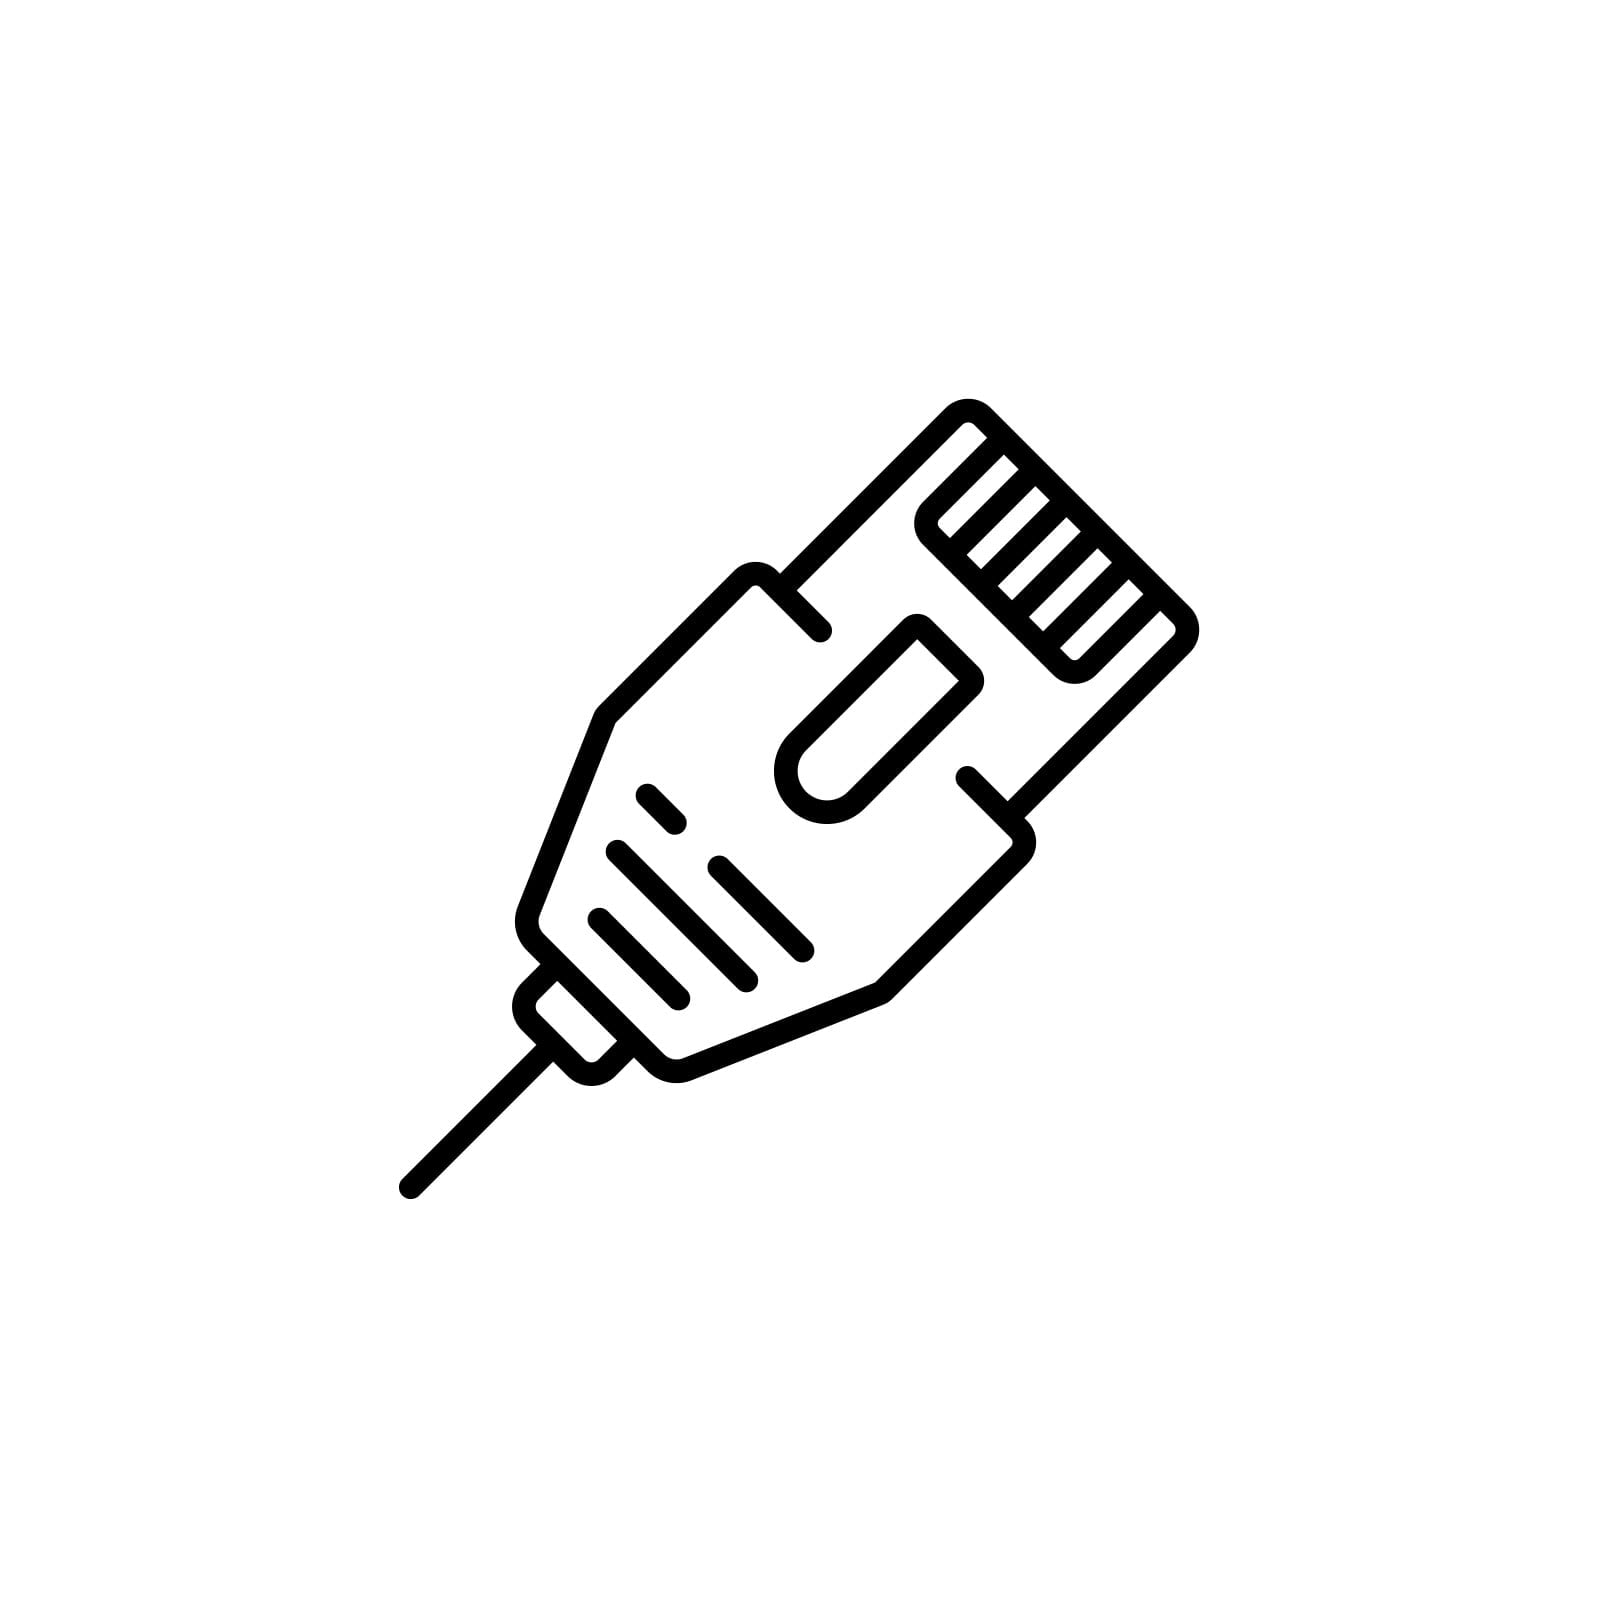 Aufpreis 10Gb Ethernet für Mac mini